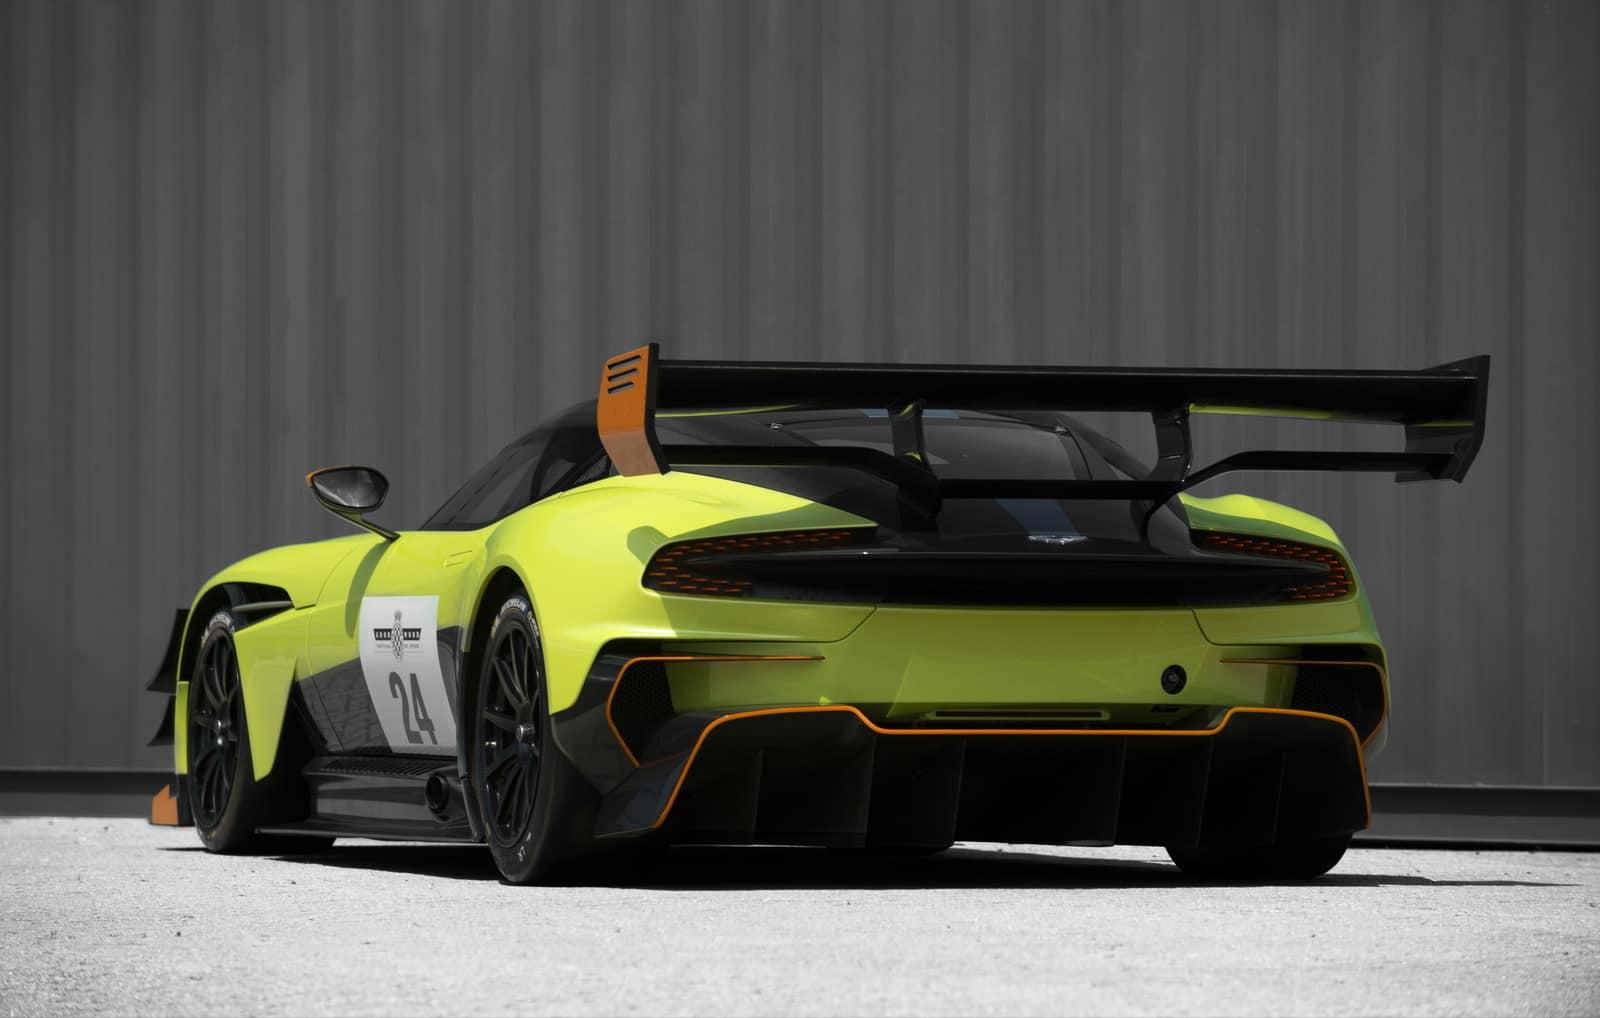 Aston Martin Vulcan AMR PRO 8